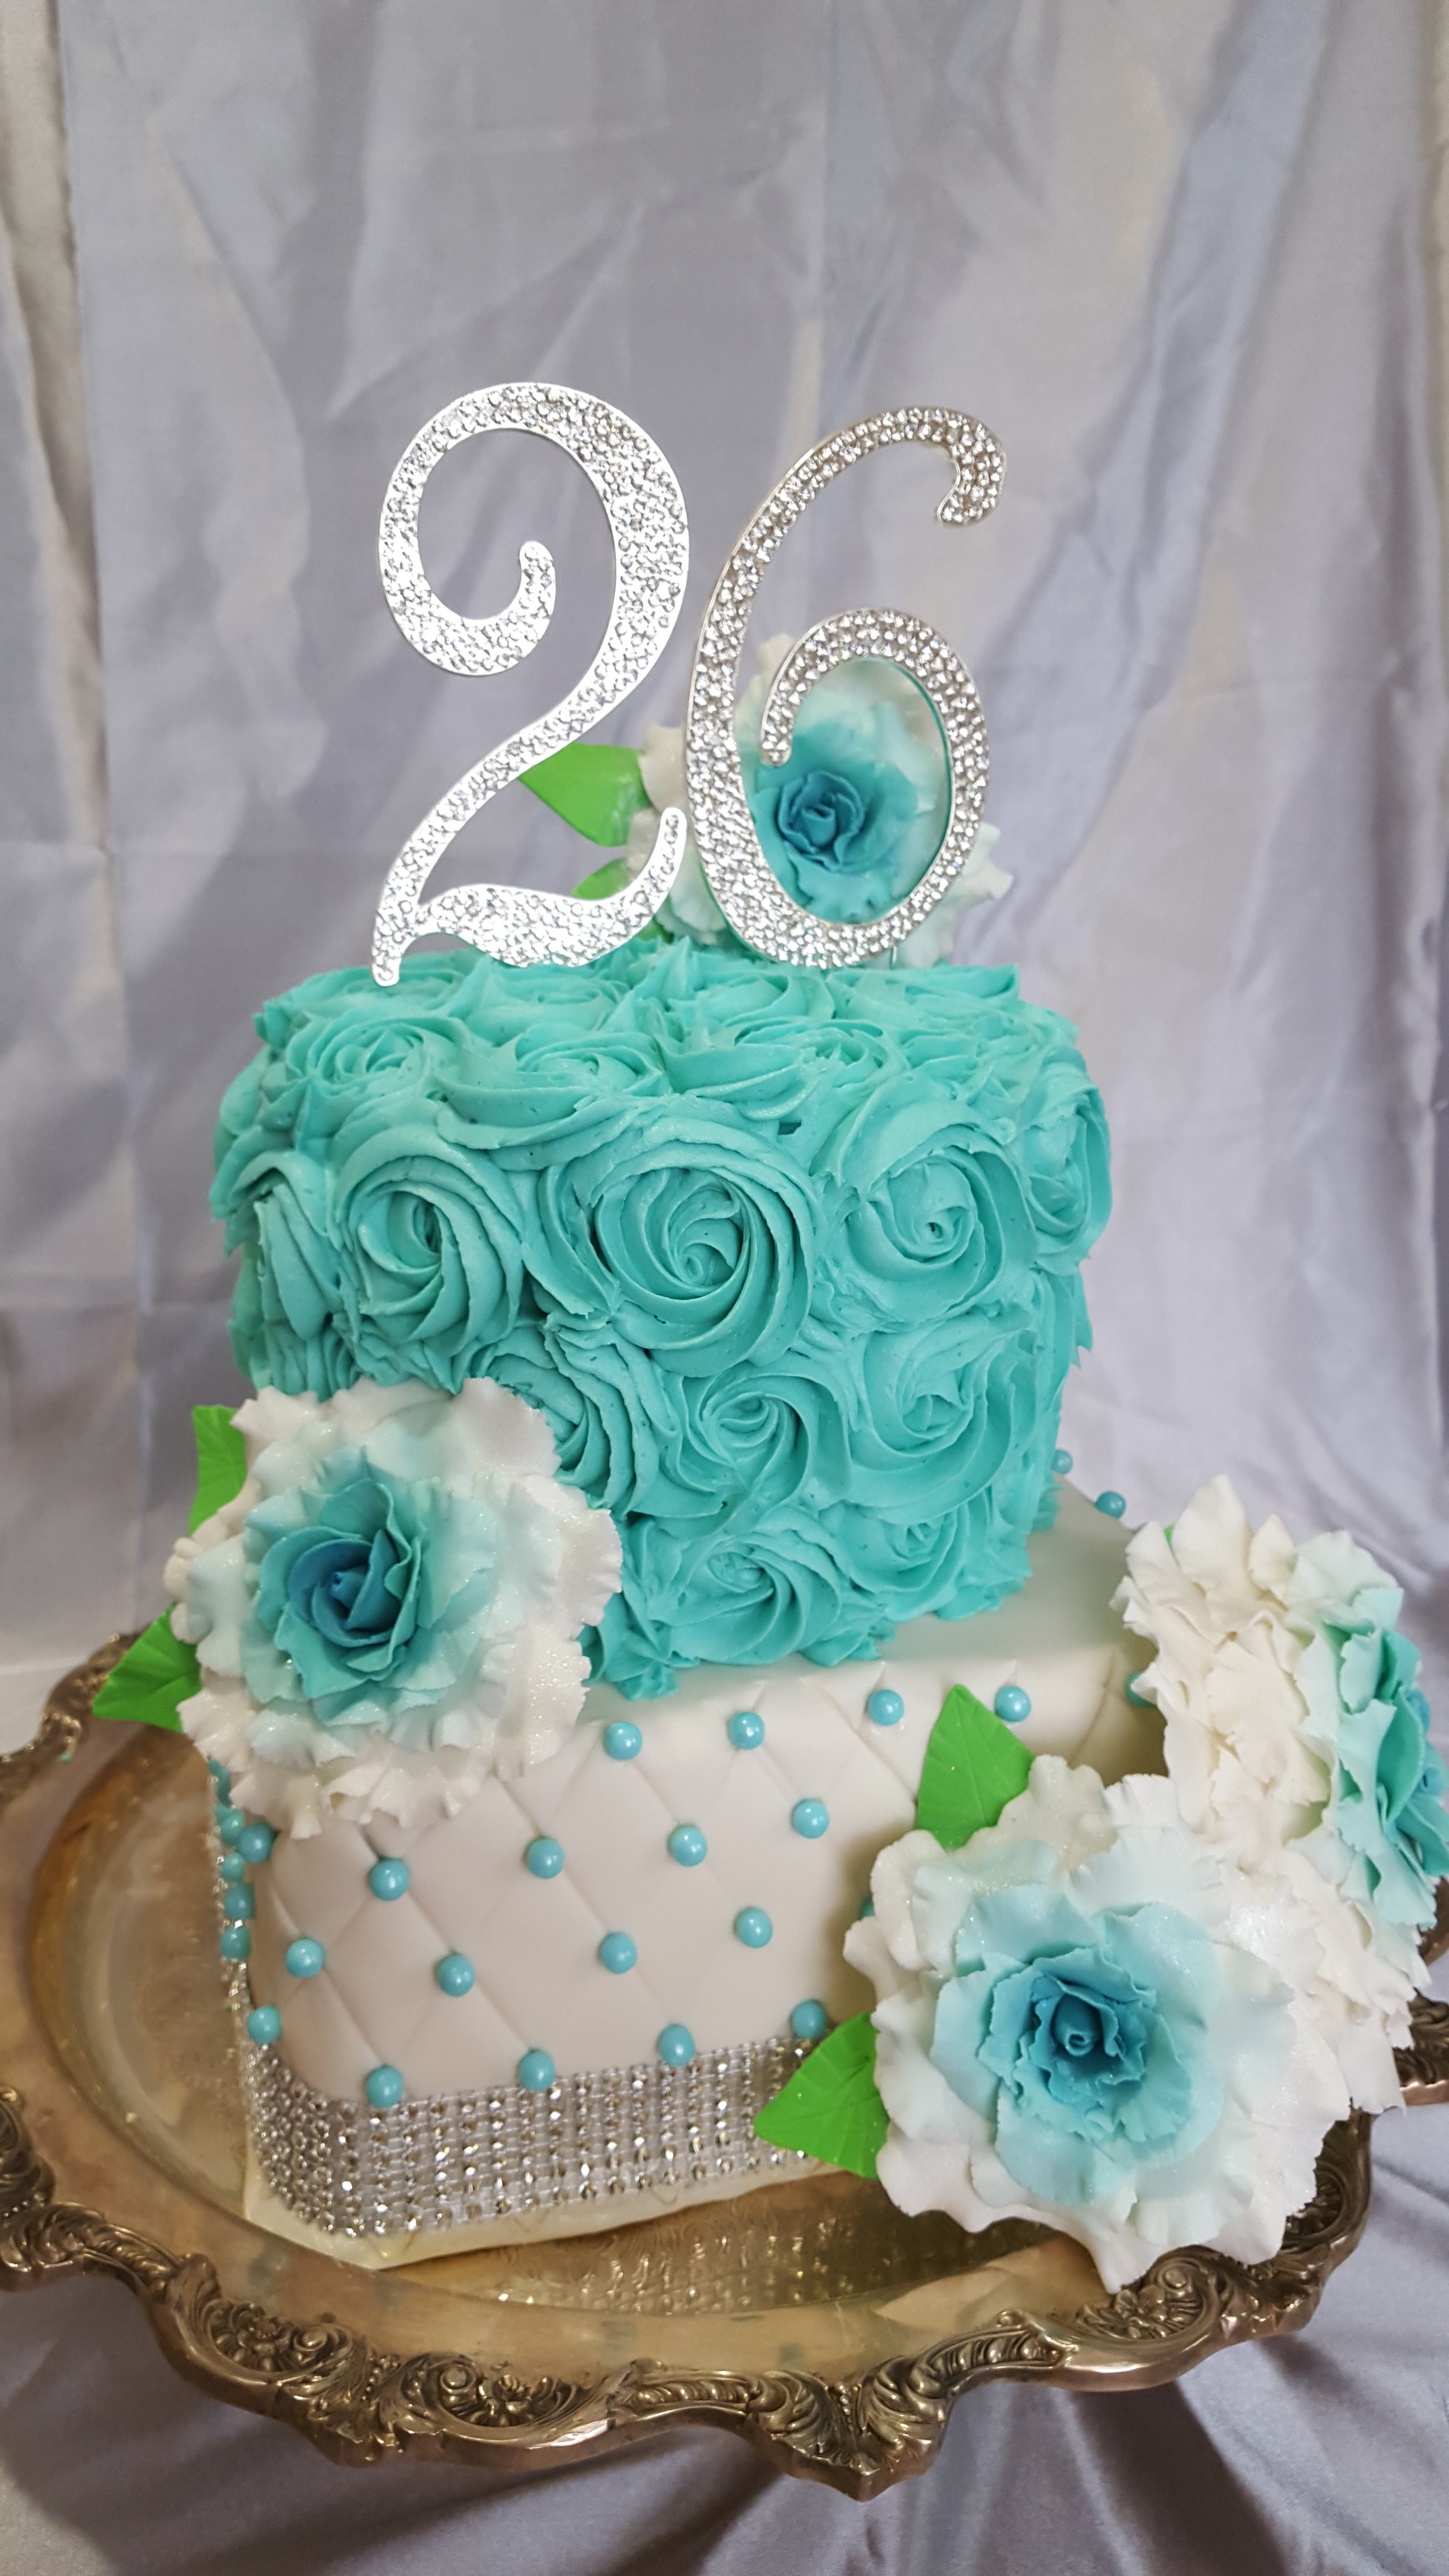 Rosette Buttercream Cake over Quilted Fondant Cake with Edible Gumpaste Roses